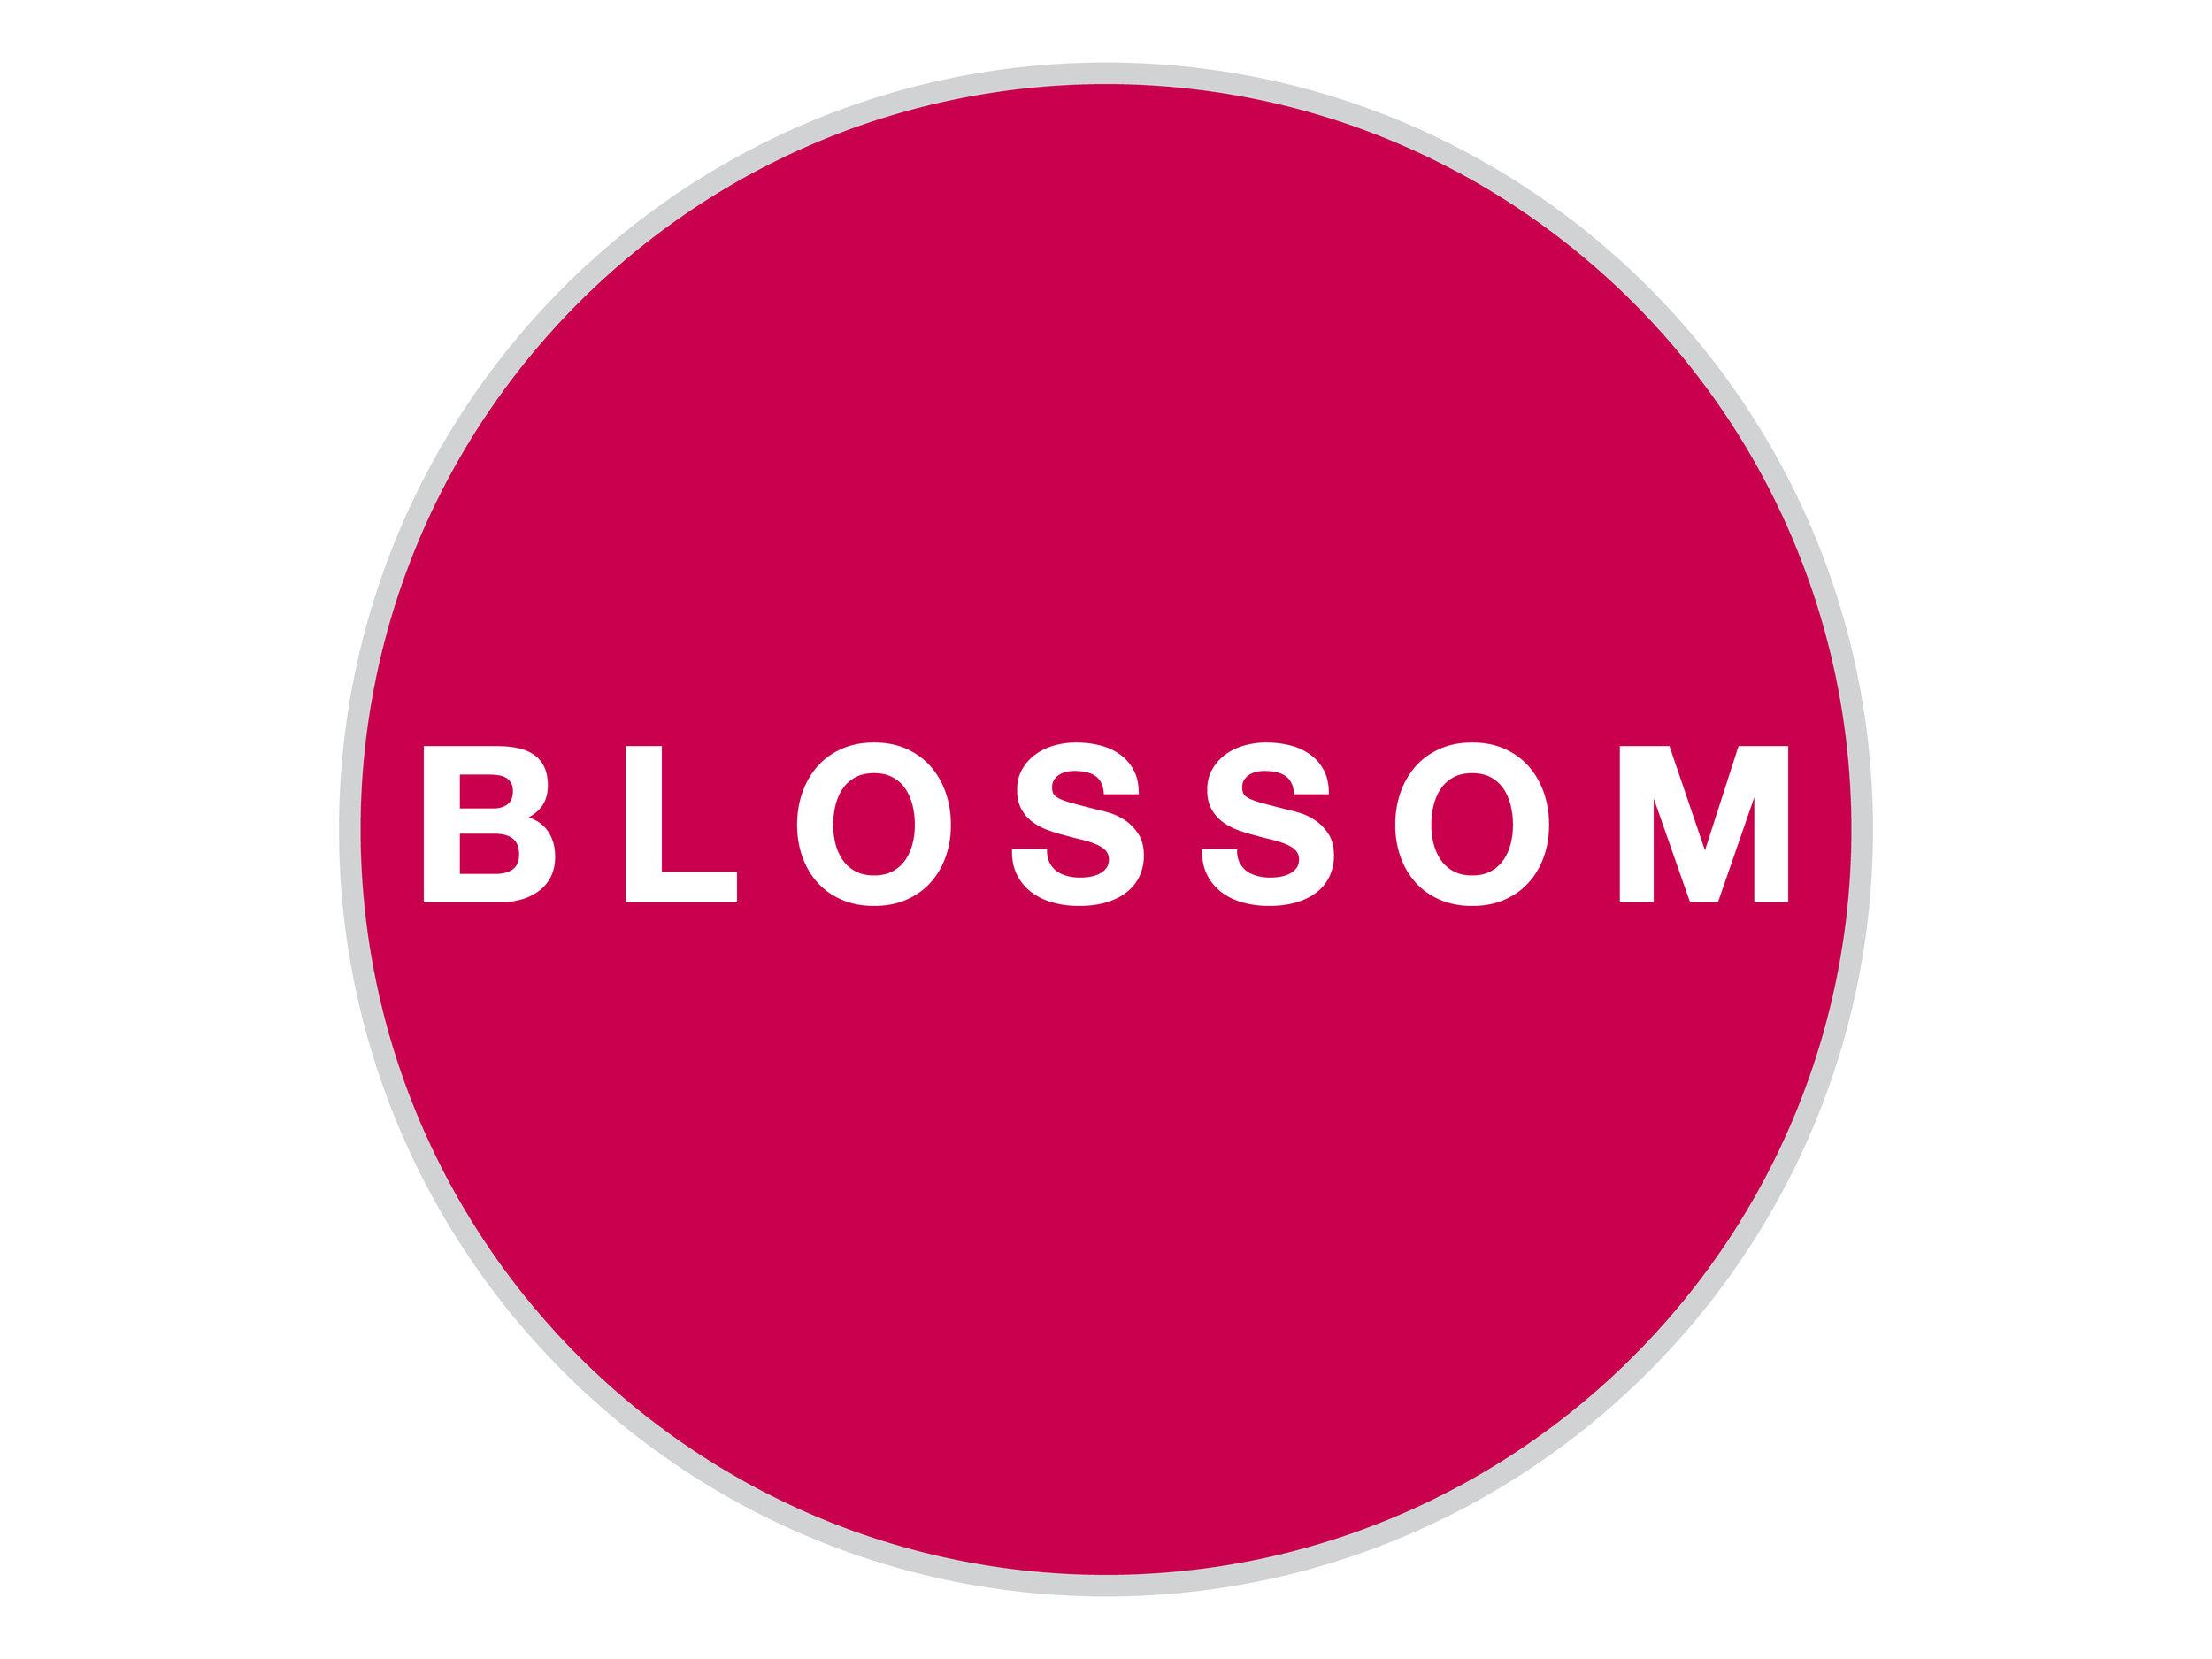 Blossom-Circle3.jpg